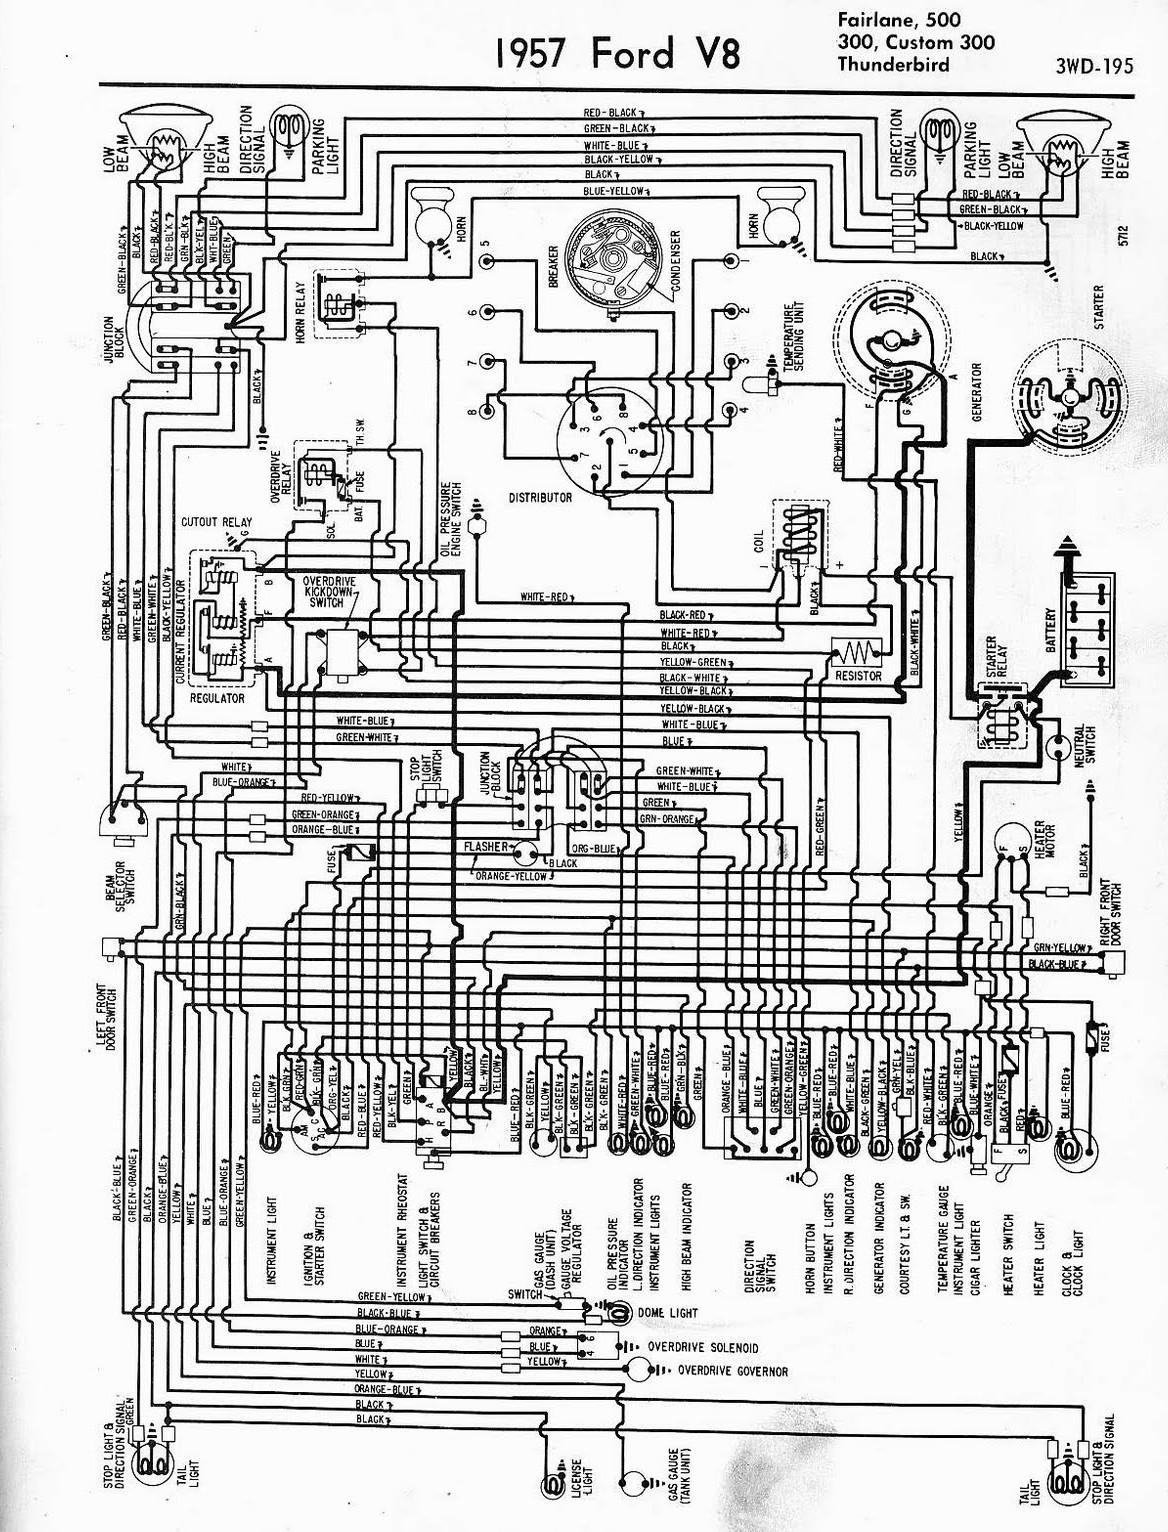 medium resolution of 1957 ford wiring schematic wiring diagram g11 1957 thunderbird wiring diagram 57 ford wiring harness wiring